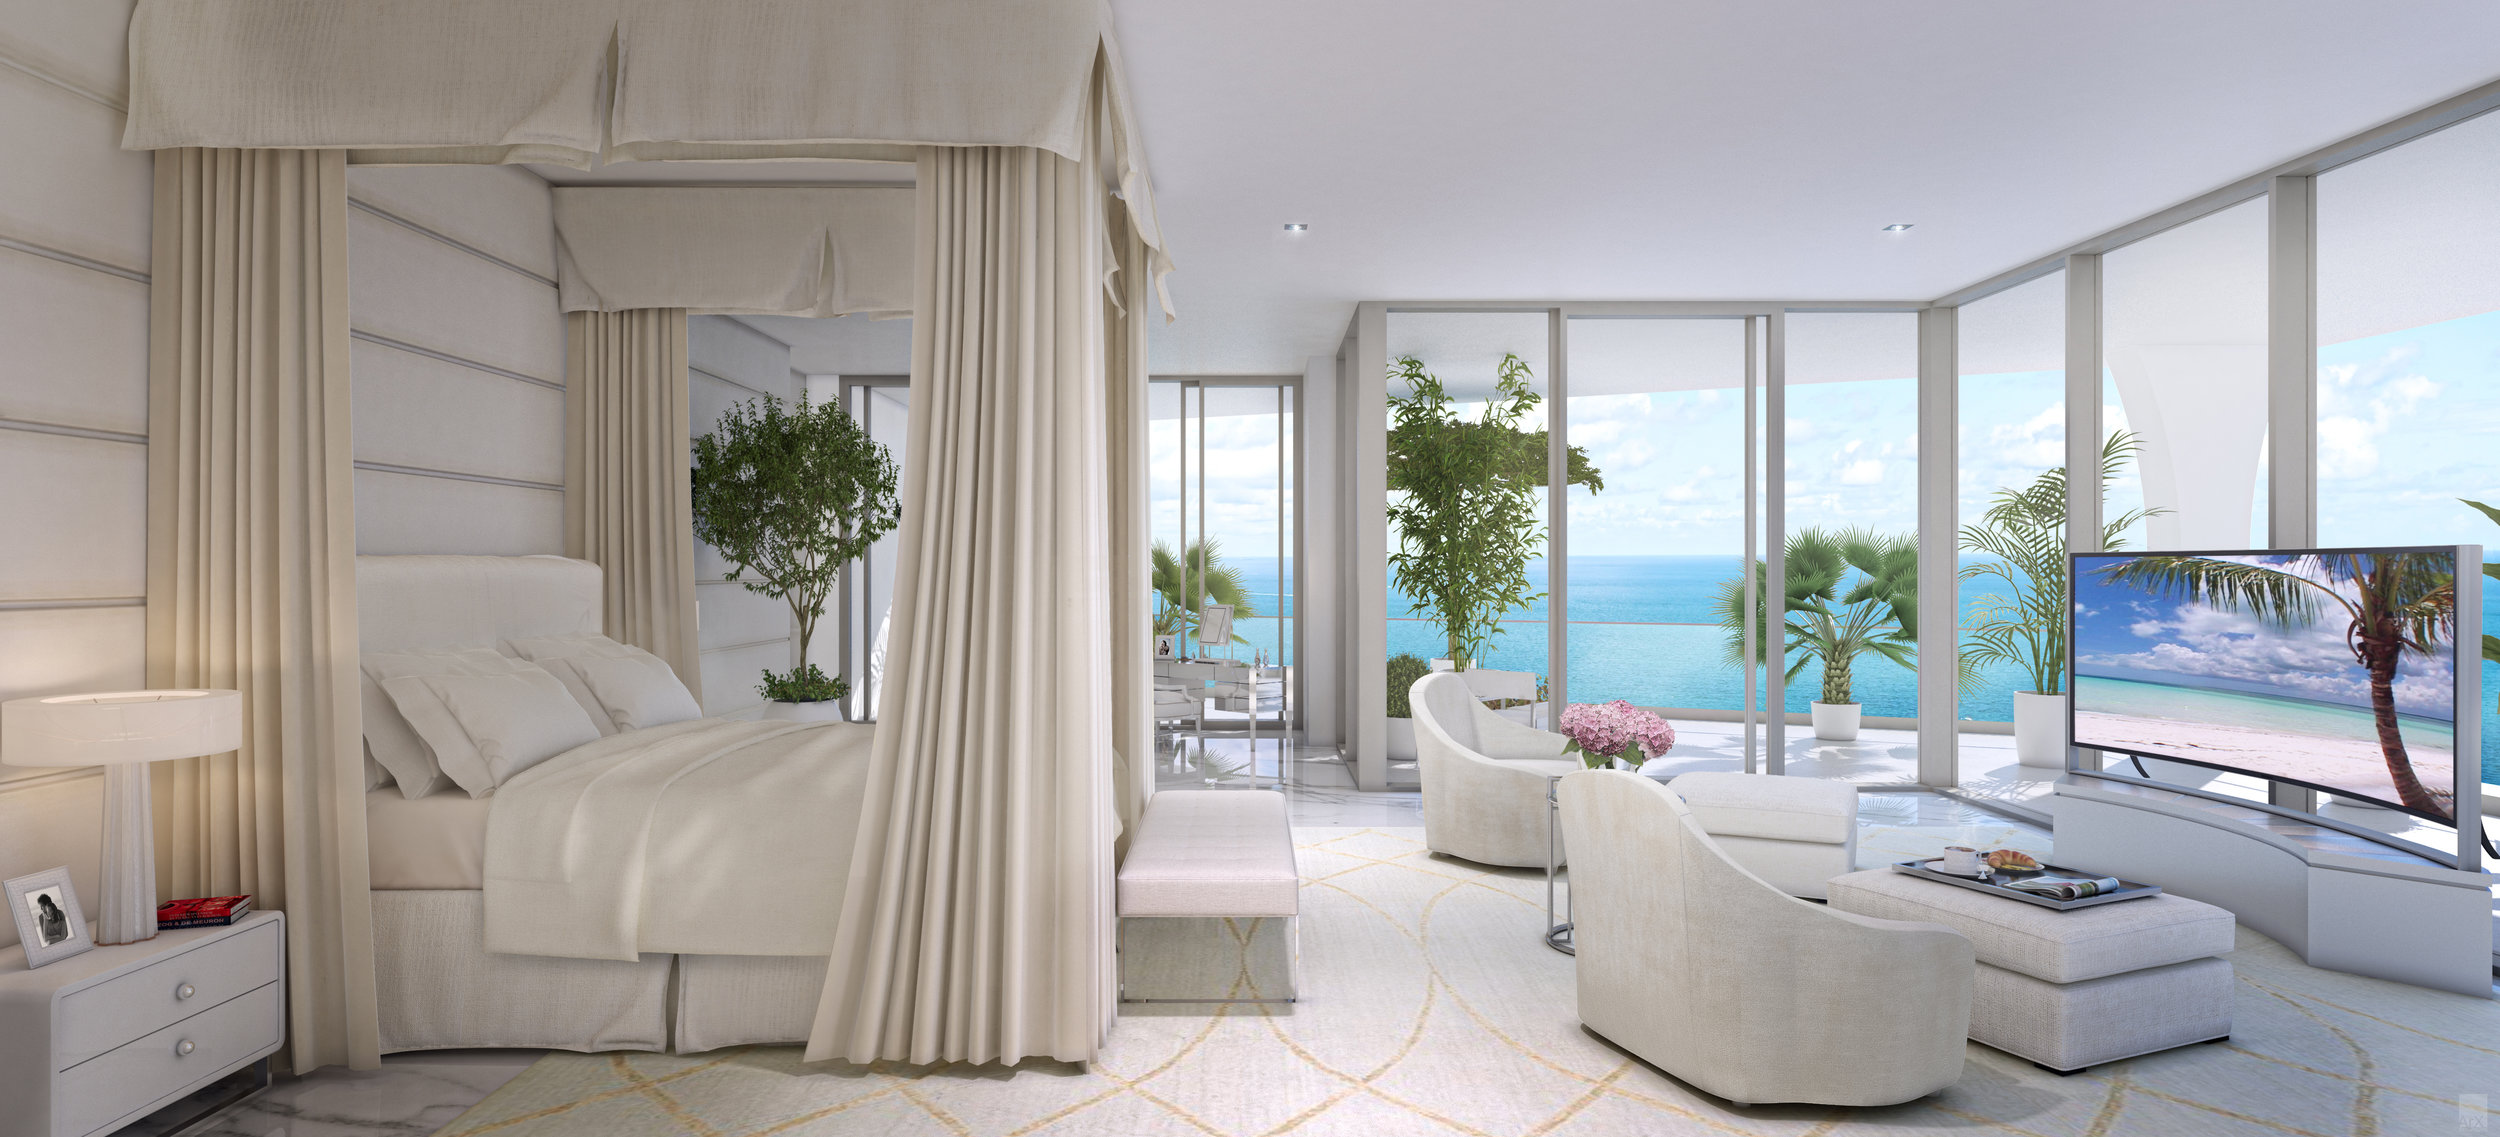 Lower Penthouse In Fortune's Herzog & de Meuron-Designed Jade Signature Sells For $18.5 Million